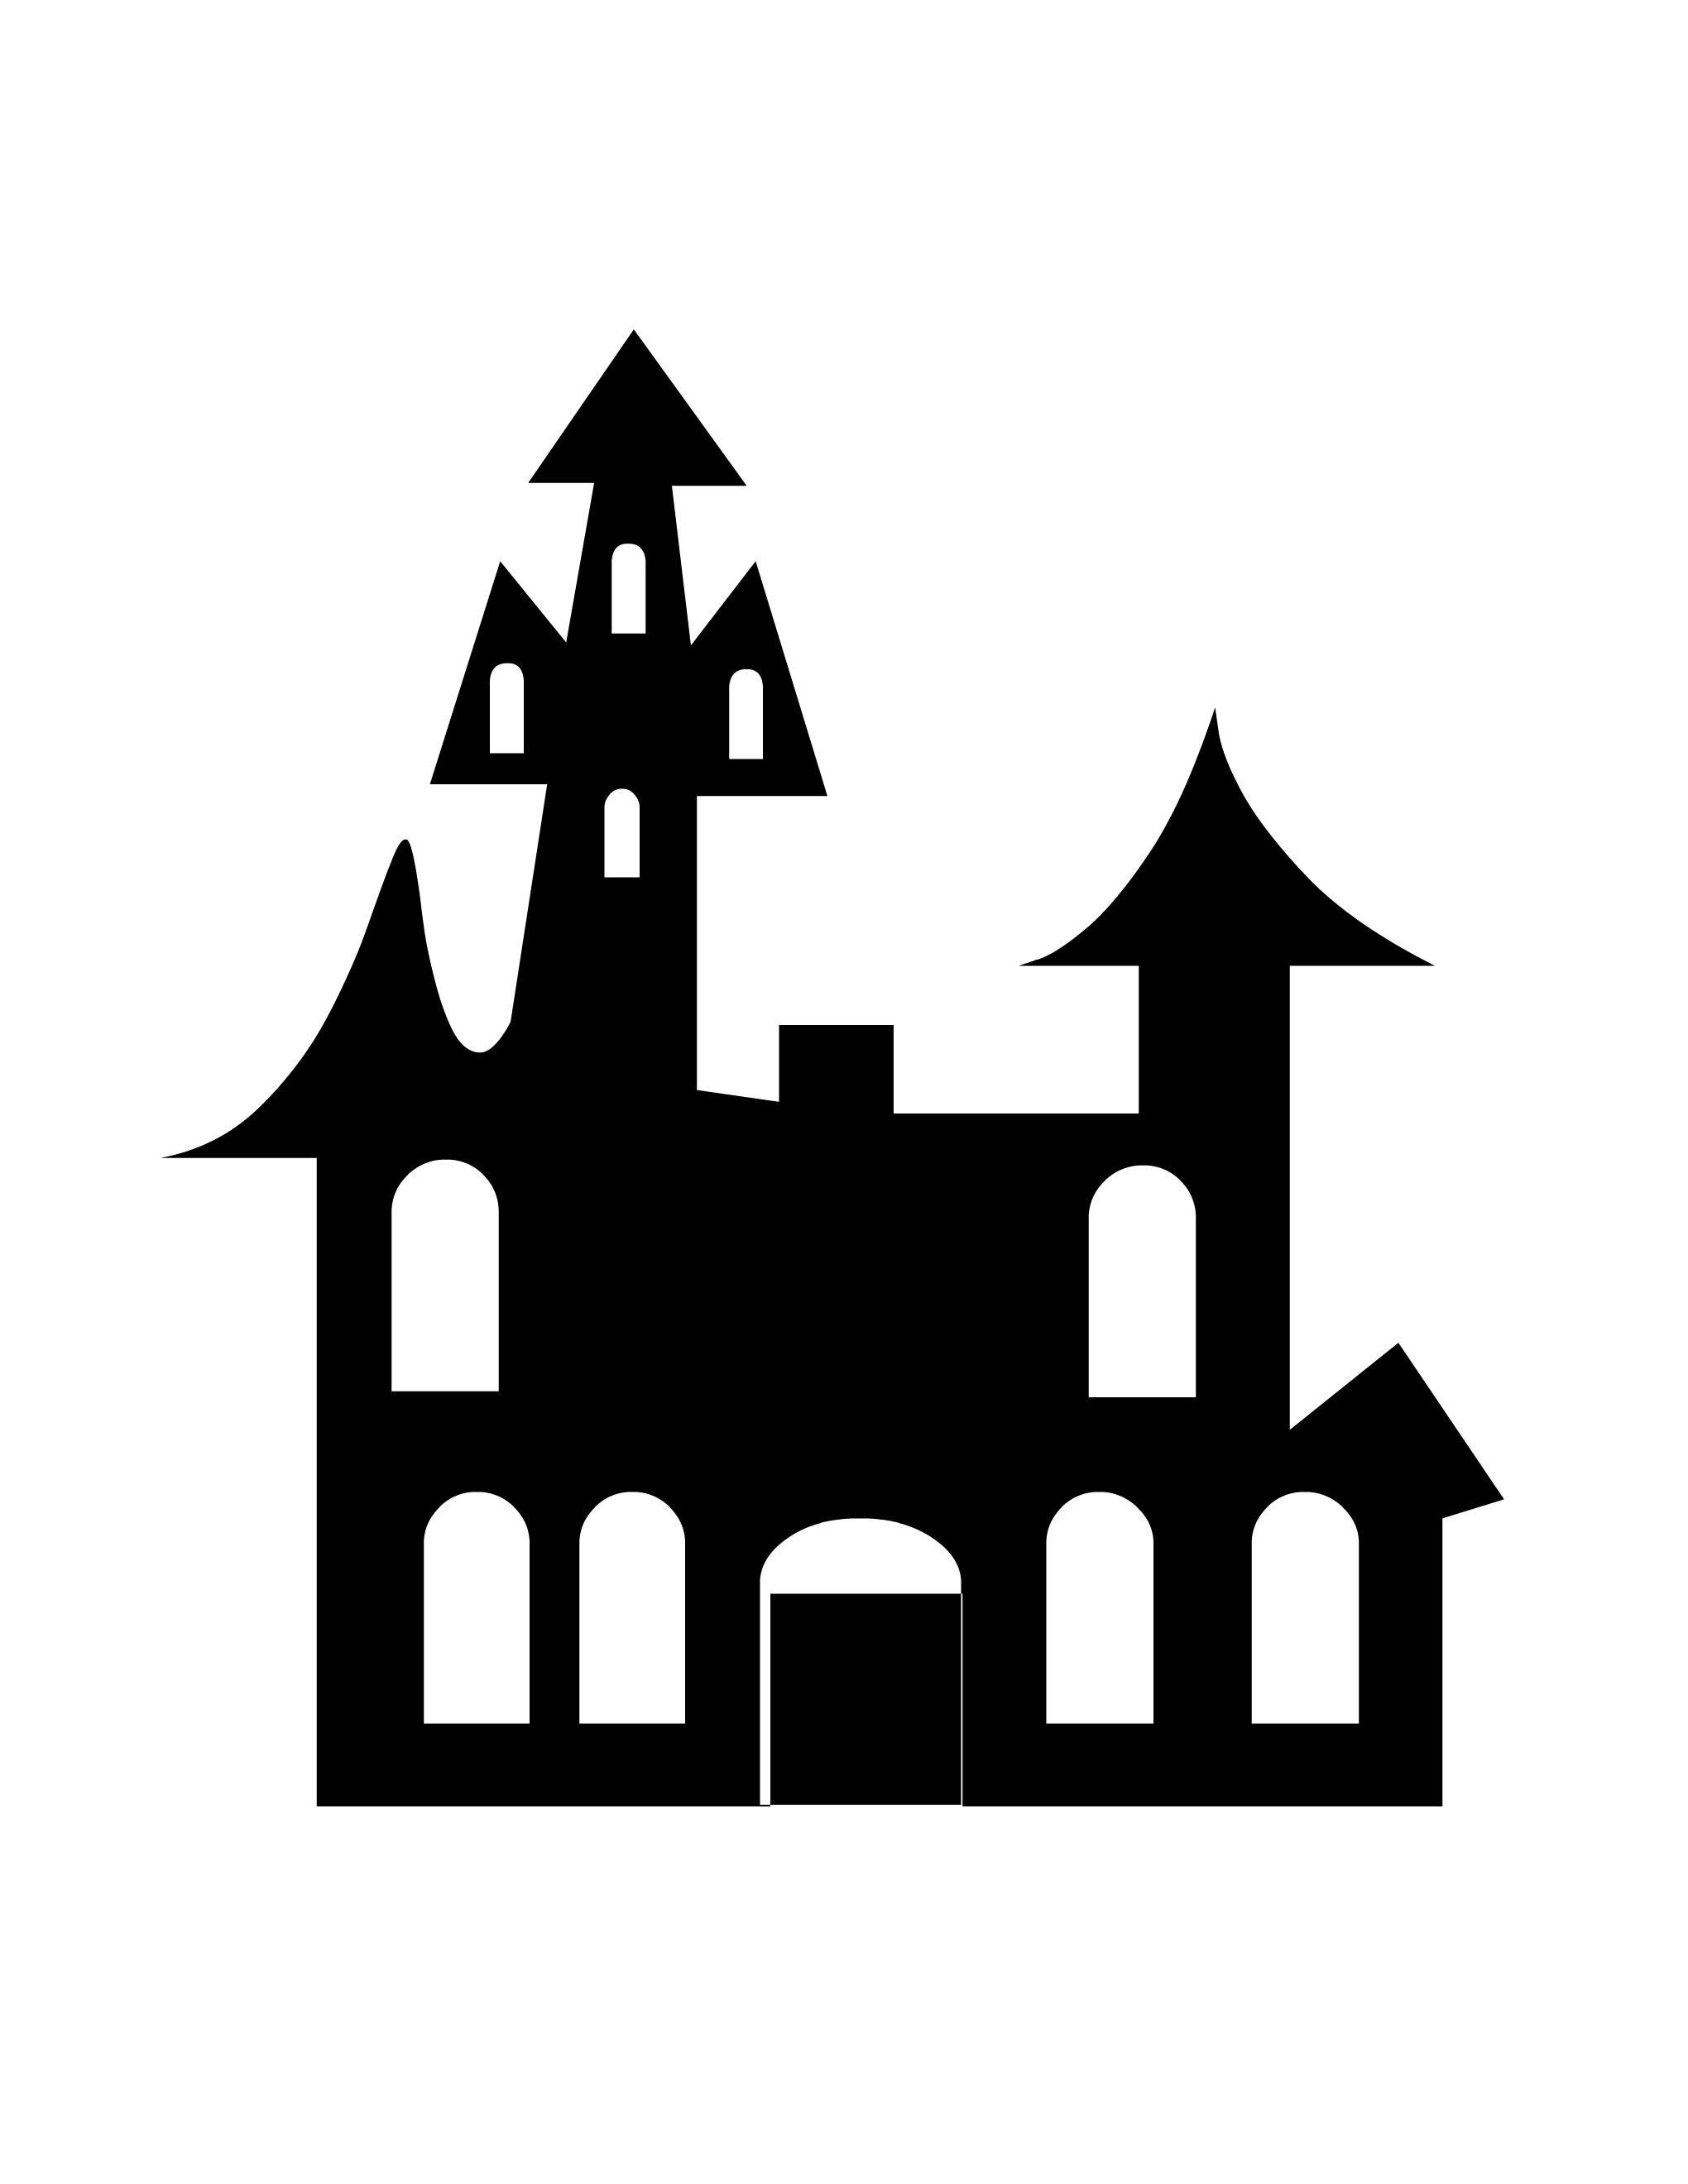 Halloween Silhouette Haunted House